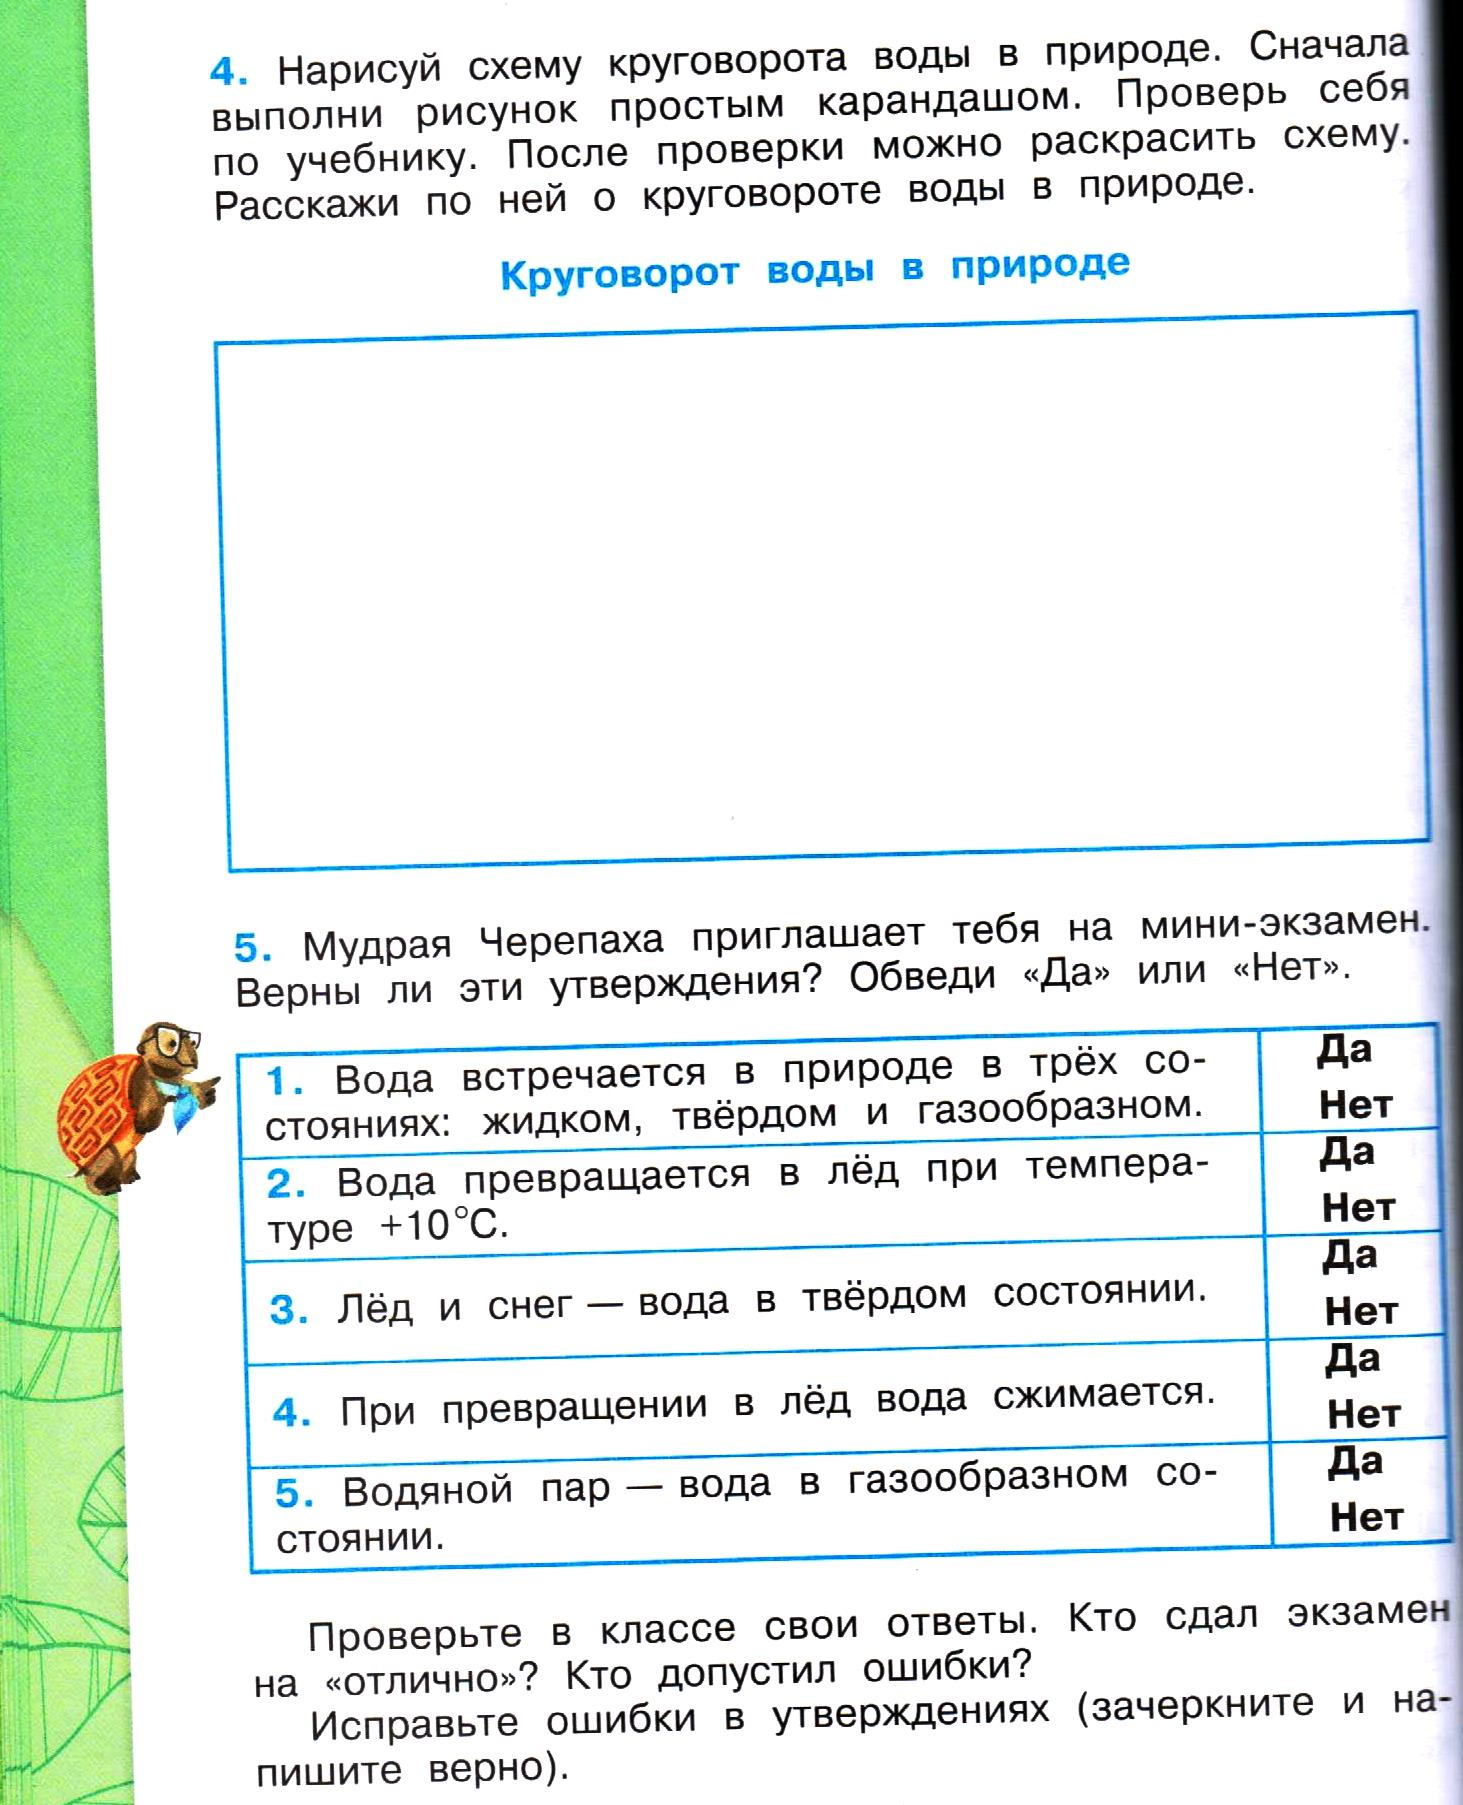 C:\Users\444\AppData\Local\Microsoft\Windows\Temporary Internet Files\Content.Word\Рисунок (8).jpg